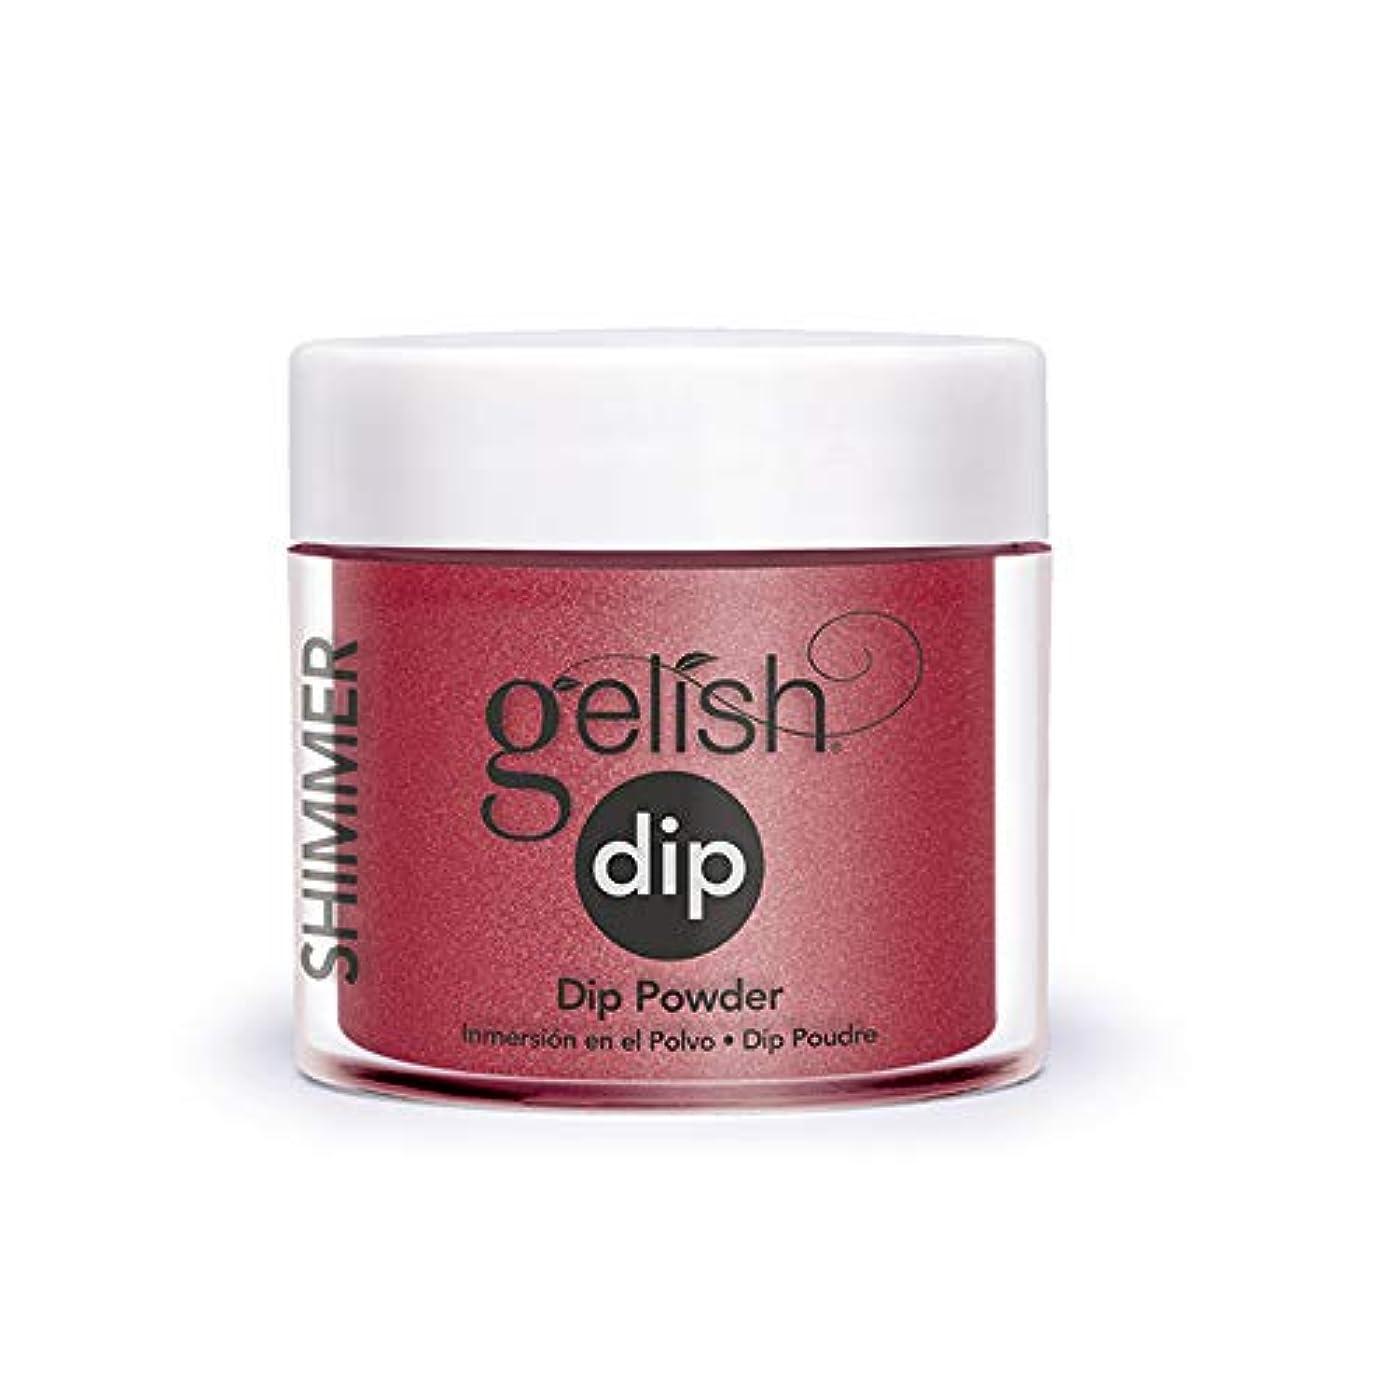 Harmony Gelish - Acrylic Dip Powder - Ruby Two-Shoes - 23g / 0.8oz